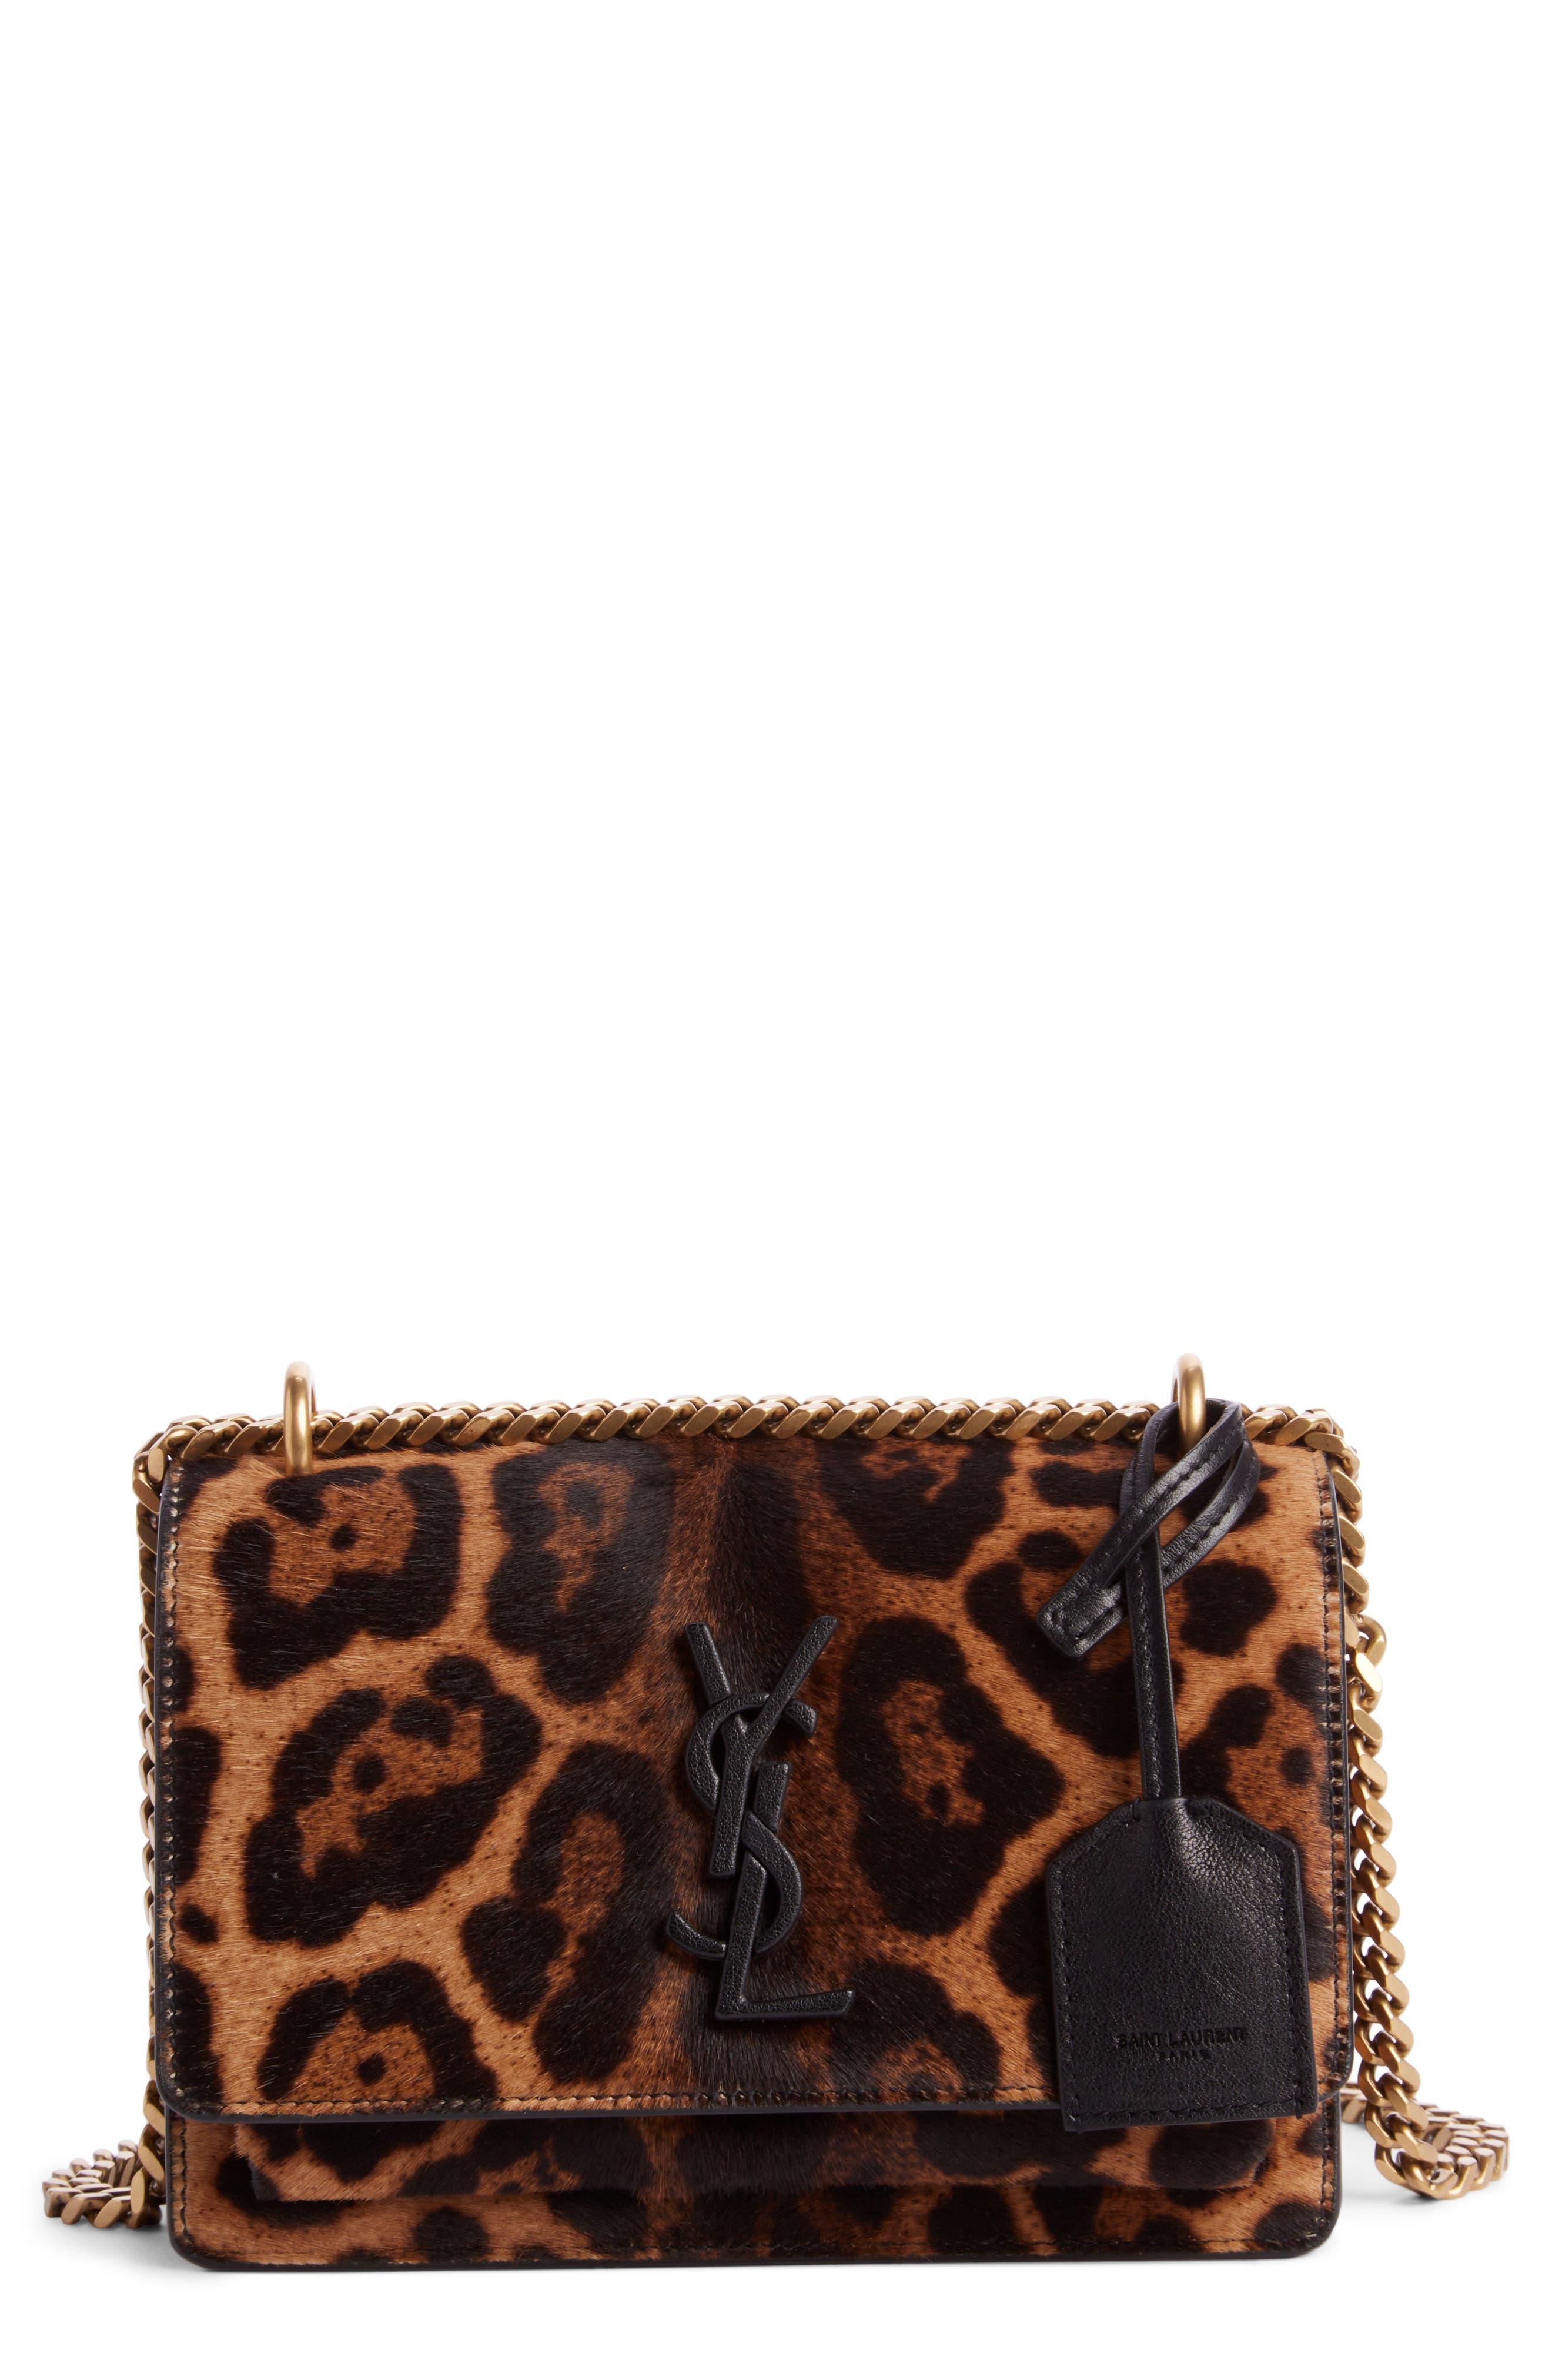 Backpacks Women's Bags Rabbit Hair Small Shoulder Bag Mobile Phone Bag Purse Shell Type Messenger Bag 40# Special Buy